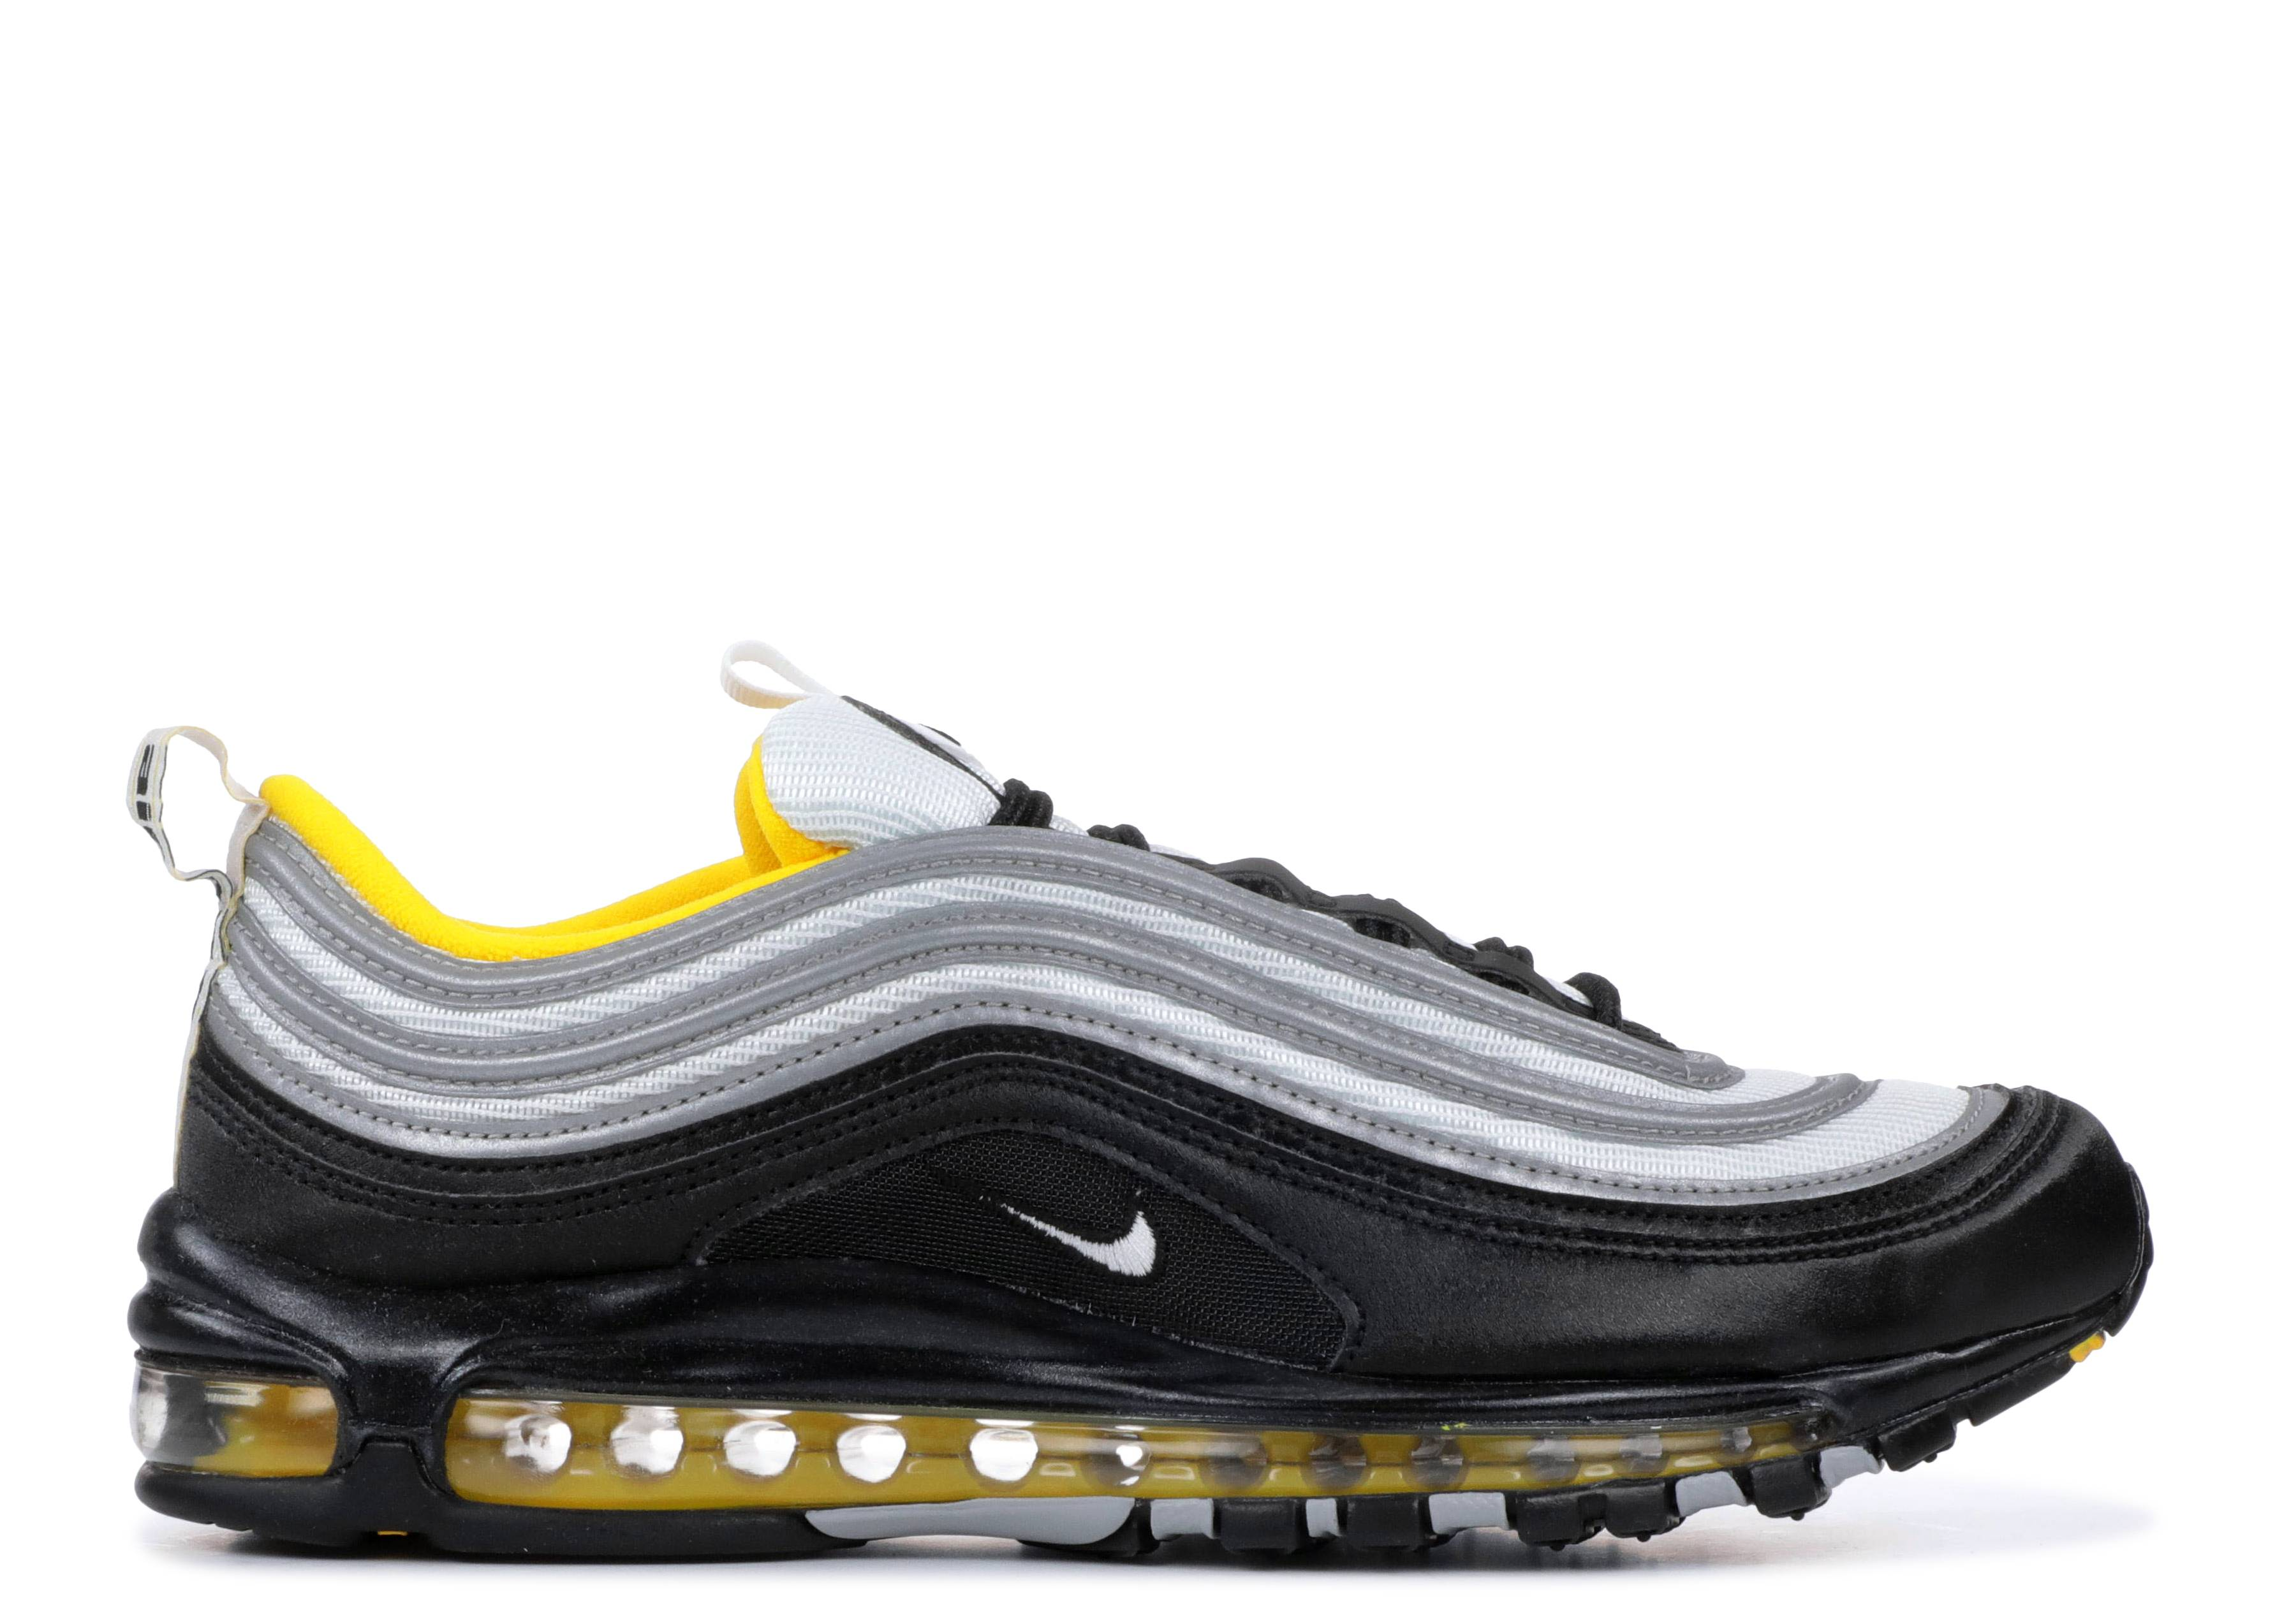 best website 15282 cd962 Nike Air Max 97 - Nike - 921826 008 - black white-amarillo   Flight Club